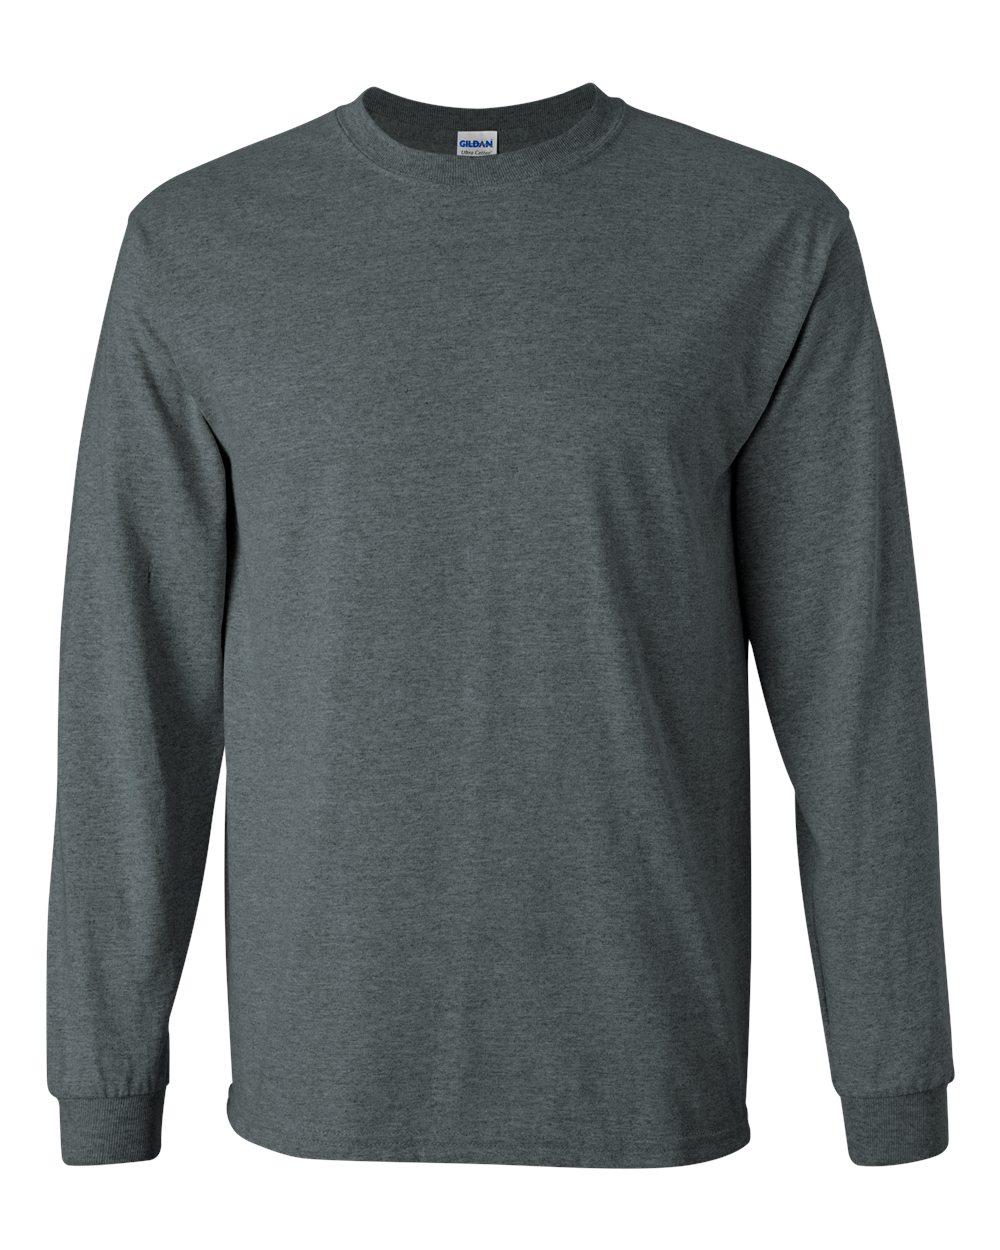 Gildan Tee Shirt T 6.1 Oz Ultra Cotton Men's Long Sleeve Basic ...